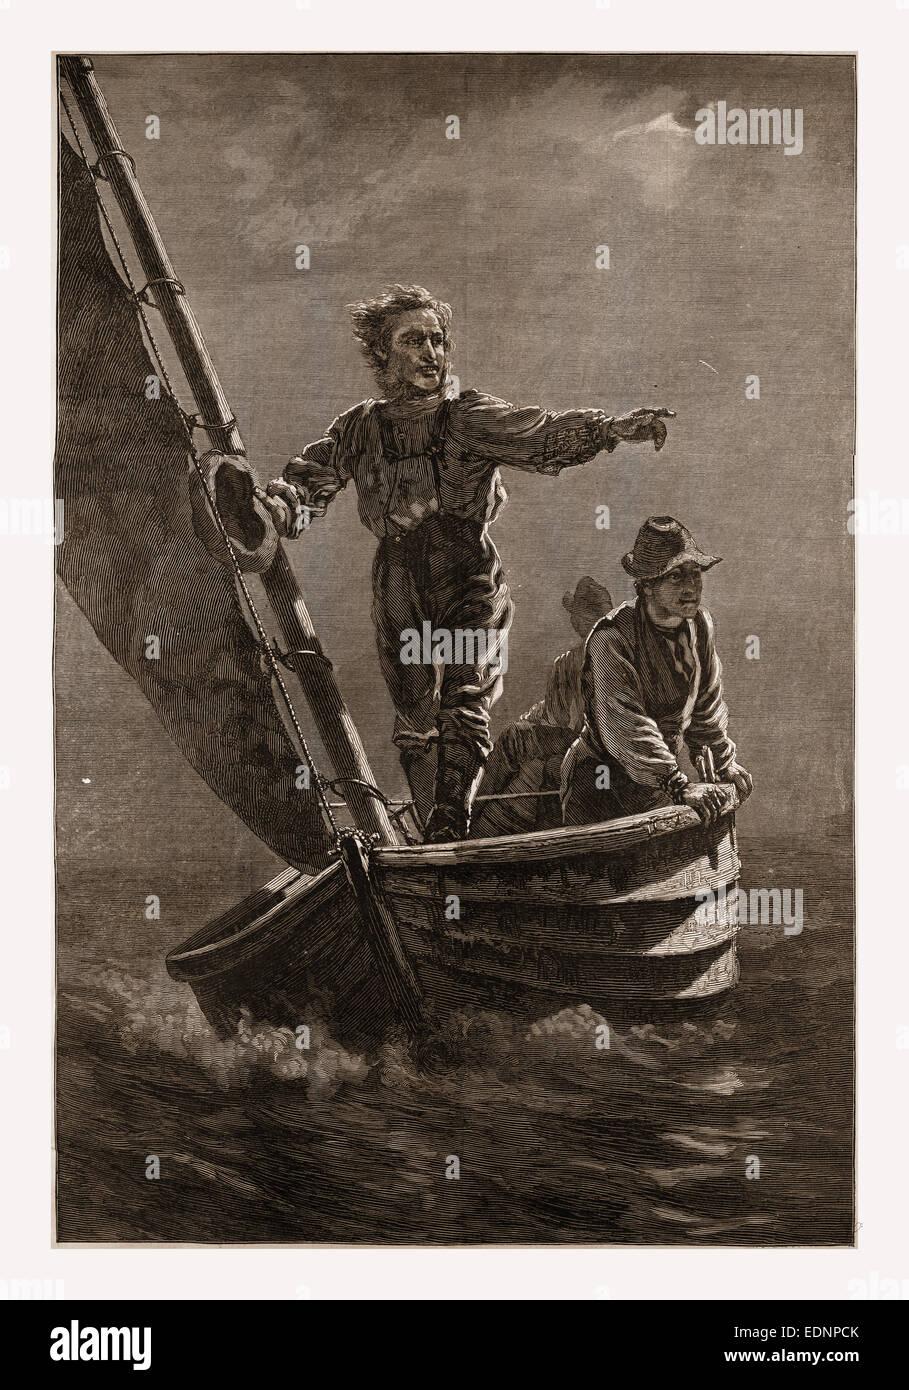 SIGHTING THE TRAWL BUOY.—DRAWN BY J. G. BROWN, 1880, 19th century engraving, USA, America - Stock Image